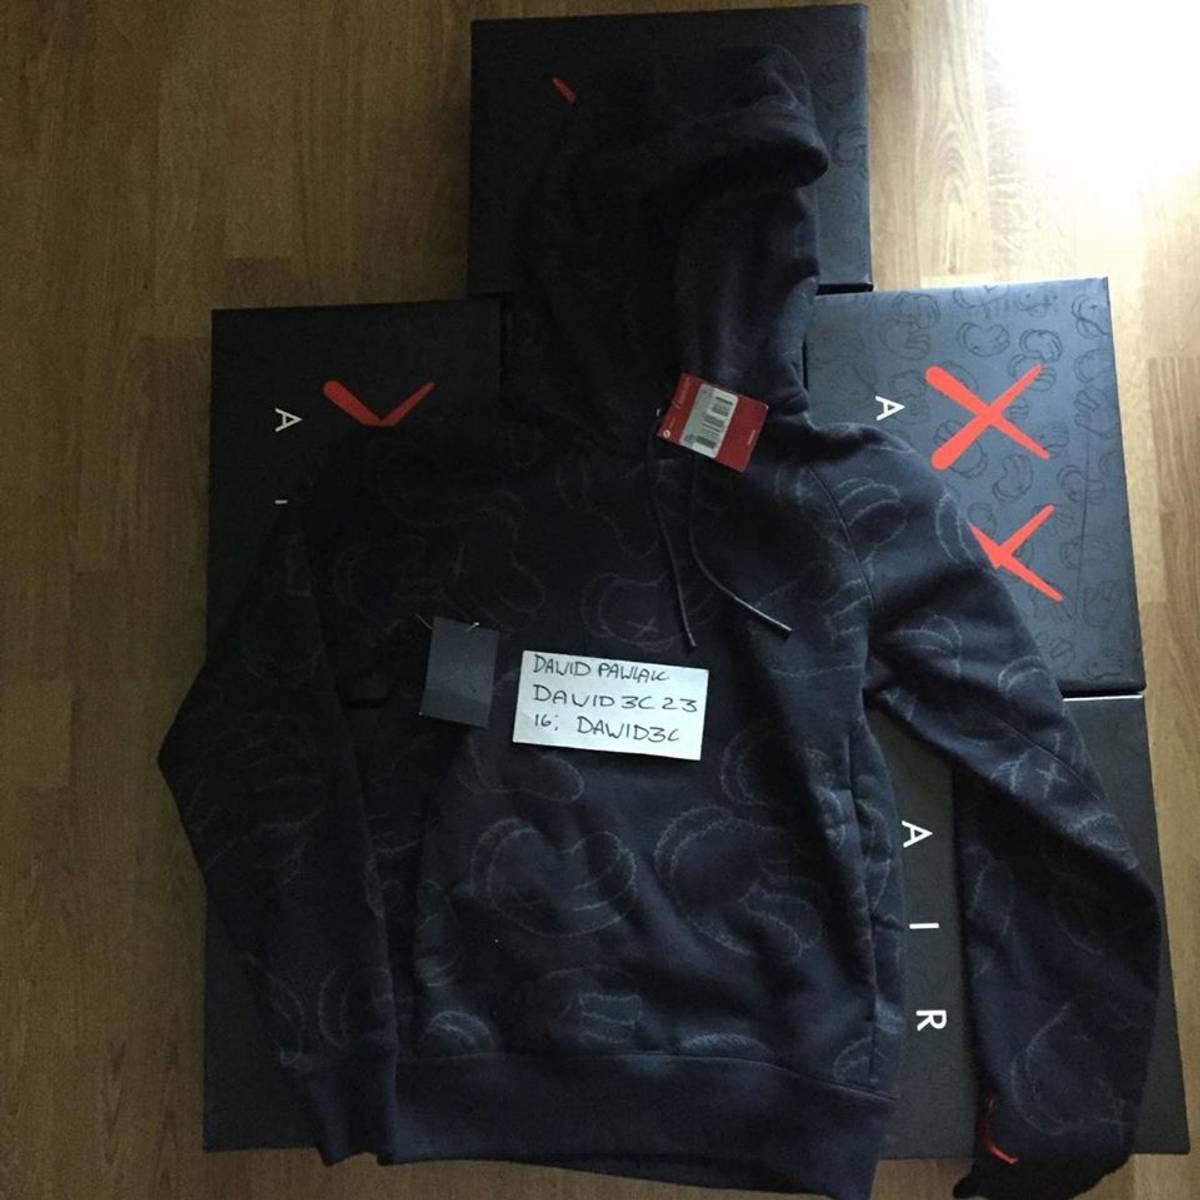 591d24b548e Jordan Brand Nike Air Jordan X Kaws Hoodie | Grailed